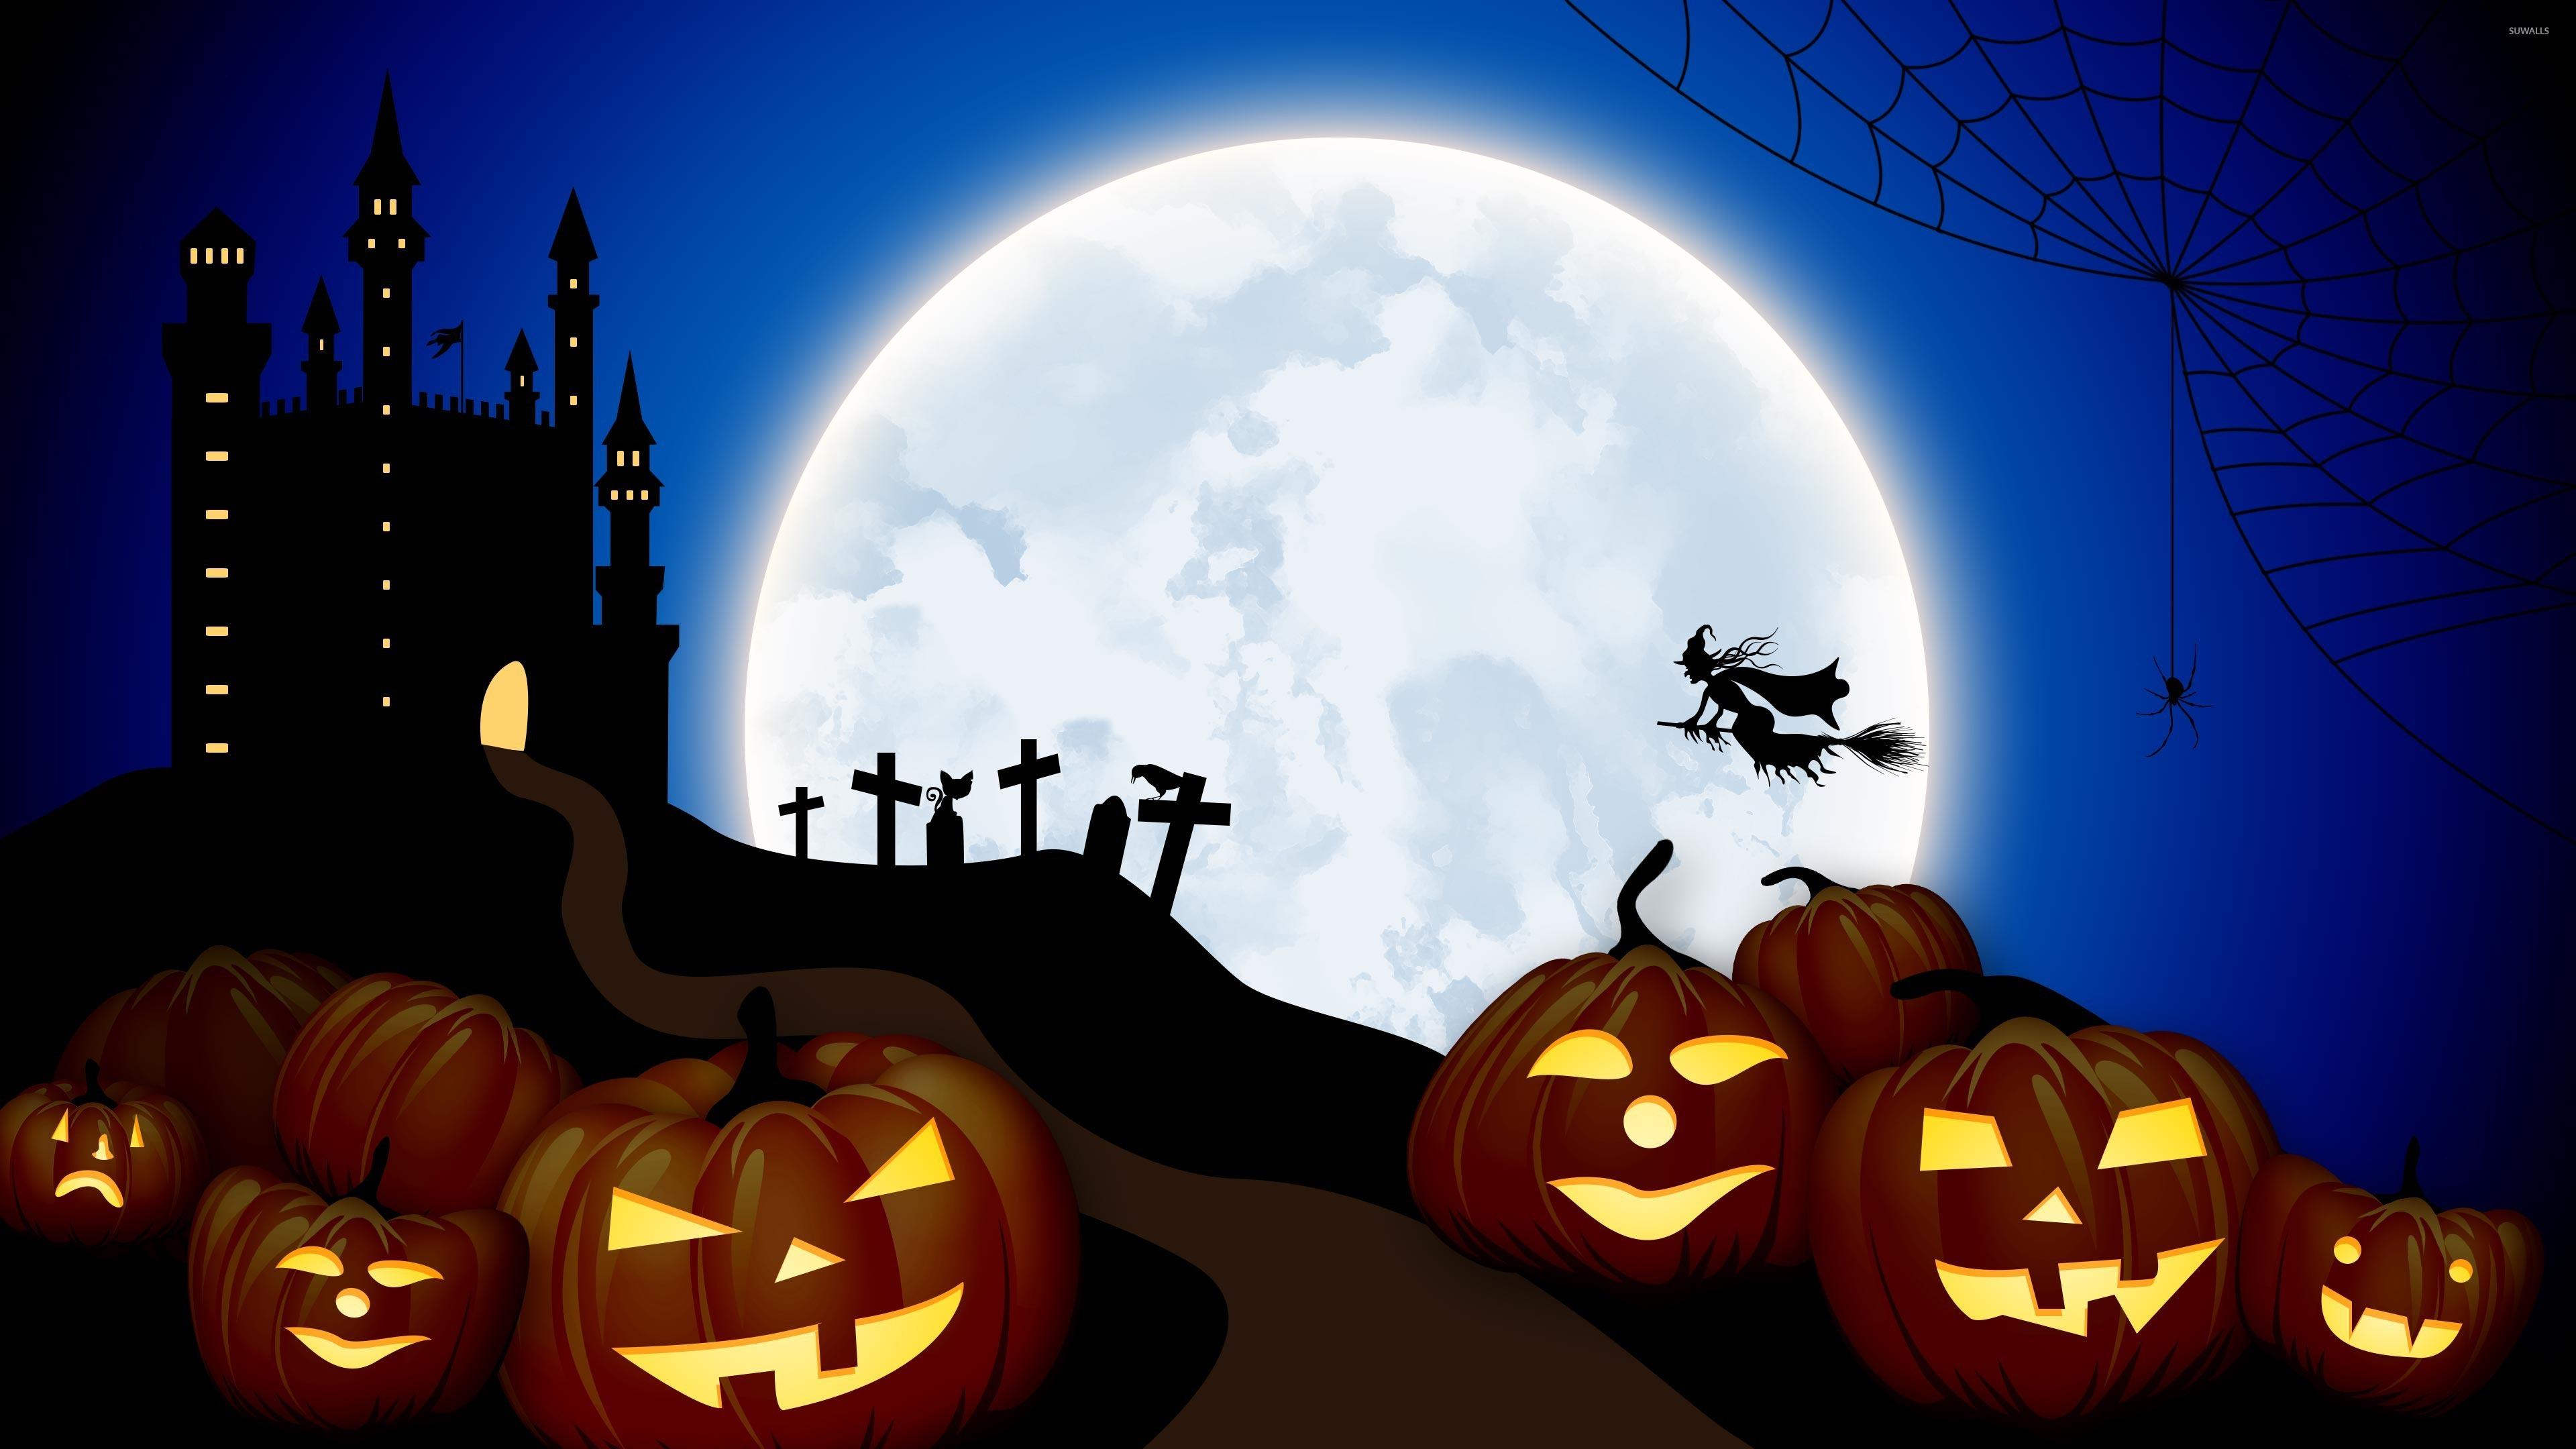 игры хэллоуина картинки маленький, самый